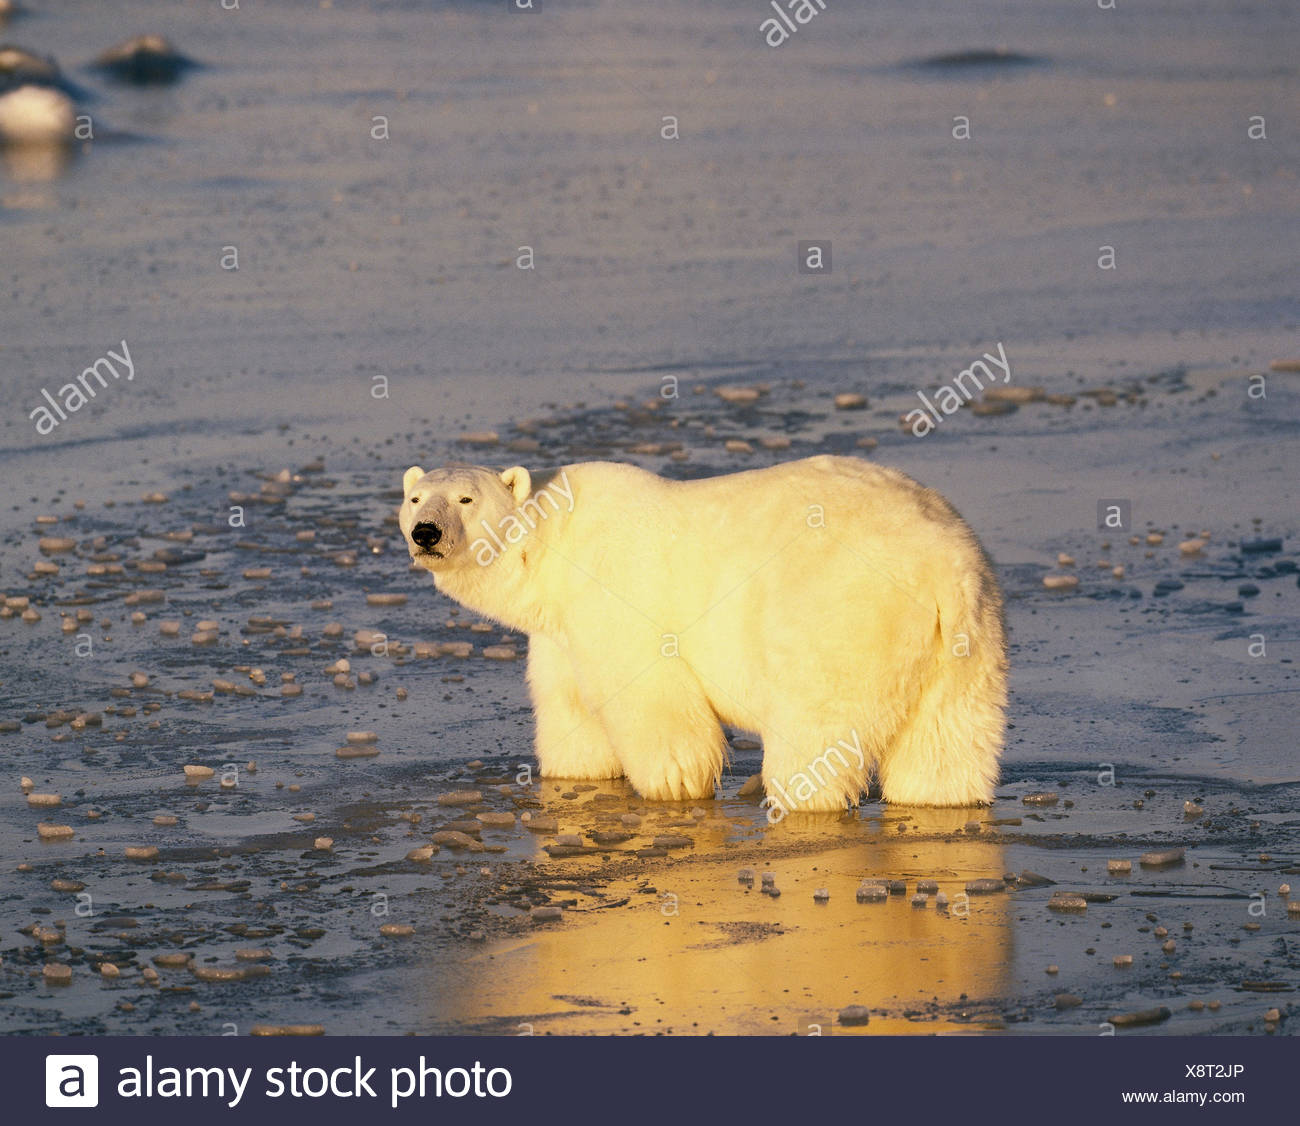 Canada, polar bear, Thalarctos maritimus, Hudson Bay, nature, scenery, animal, bear, Ursus maritimus, freedom, wild animals, habitat, travelling route, raid, individually, loner, white, polar bear, Thalarctos maritimus, Hudson Bay, Canada - Stock Image